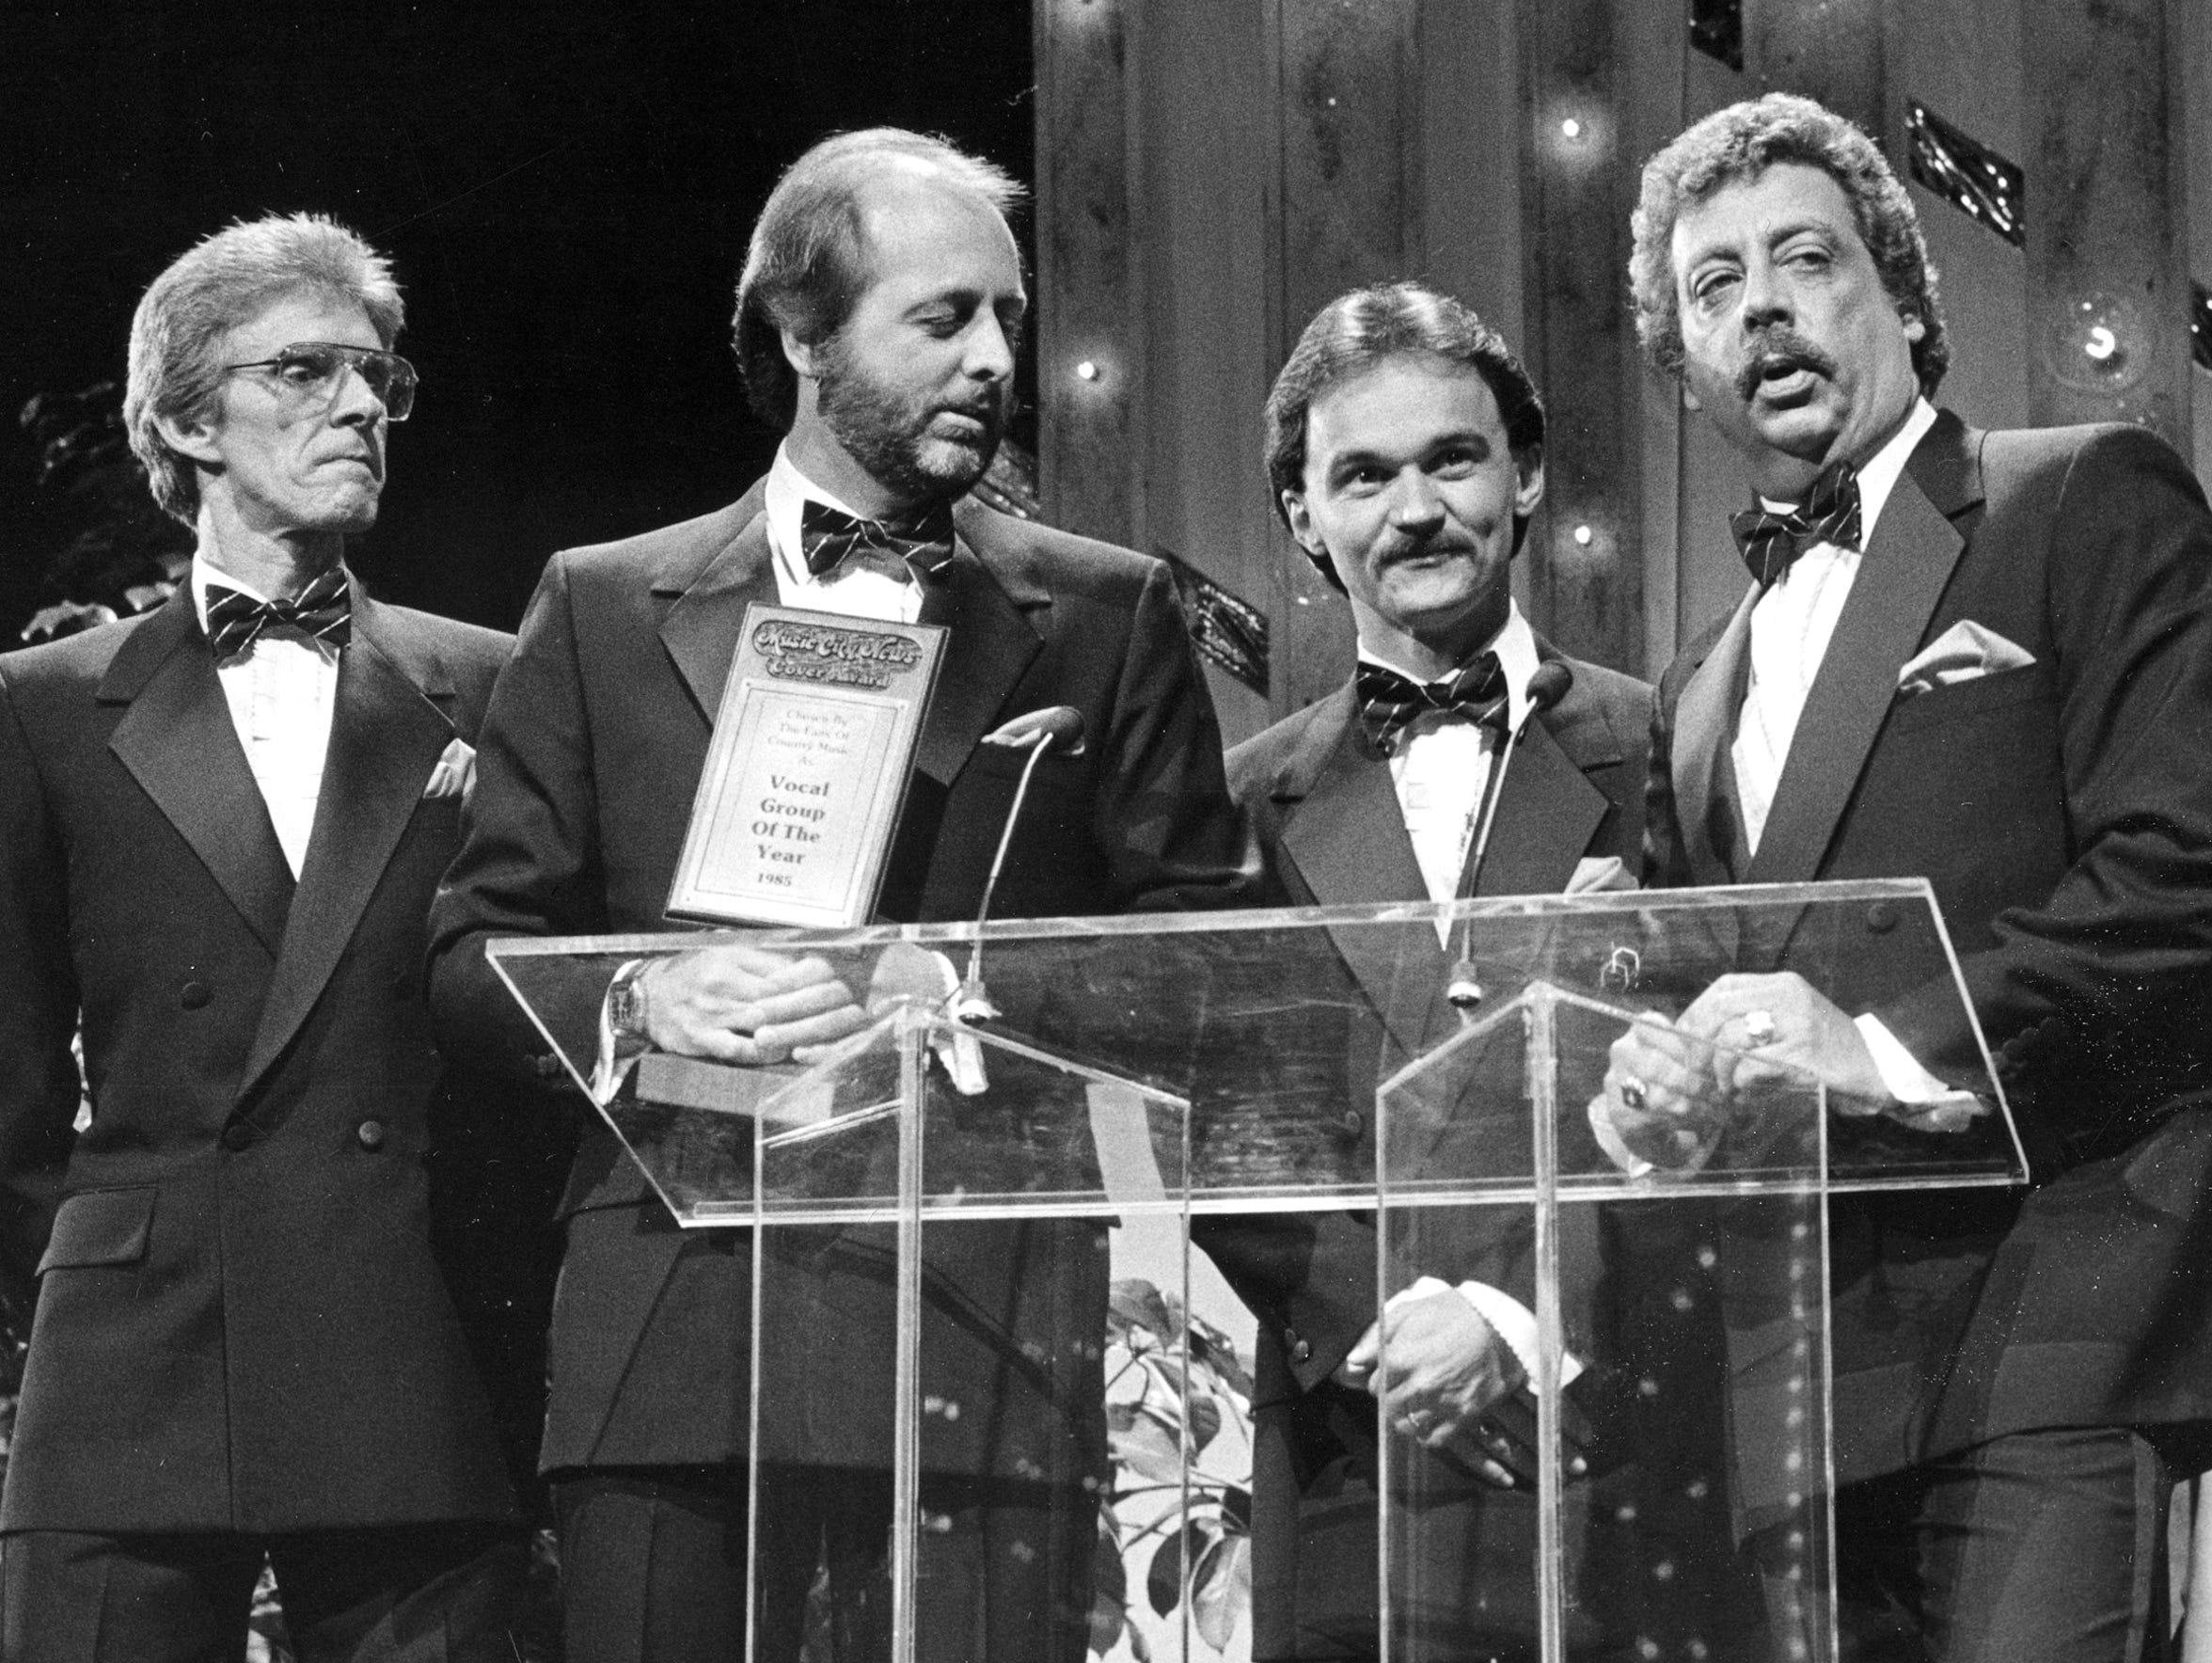 The Statler Brothers — Phil Balsley, Don Reid, Jimmy